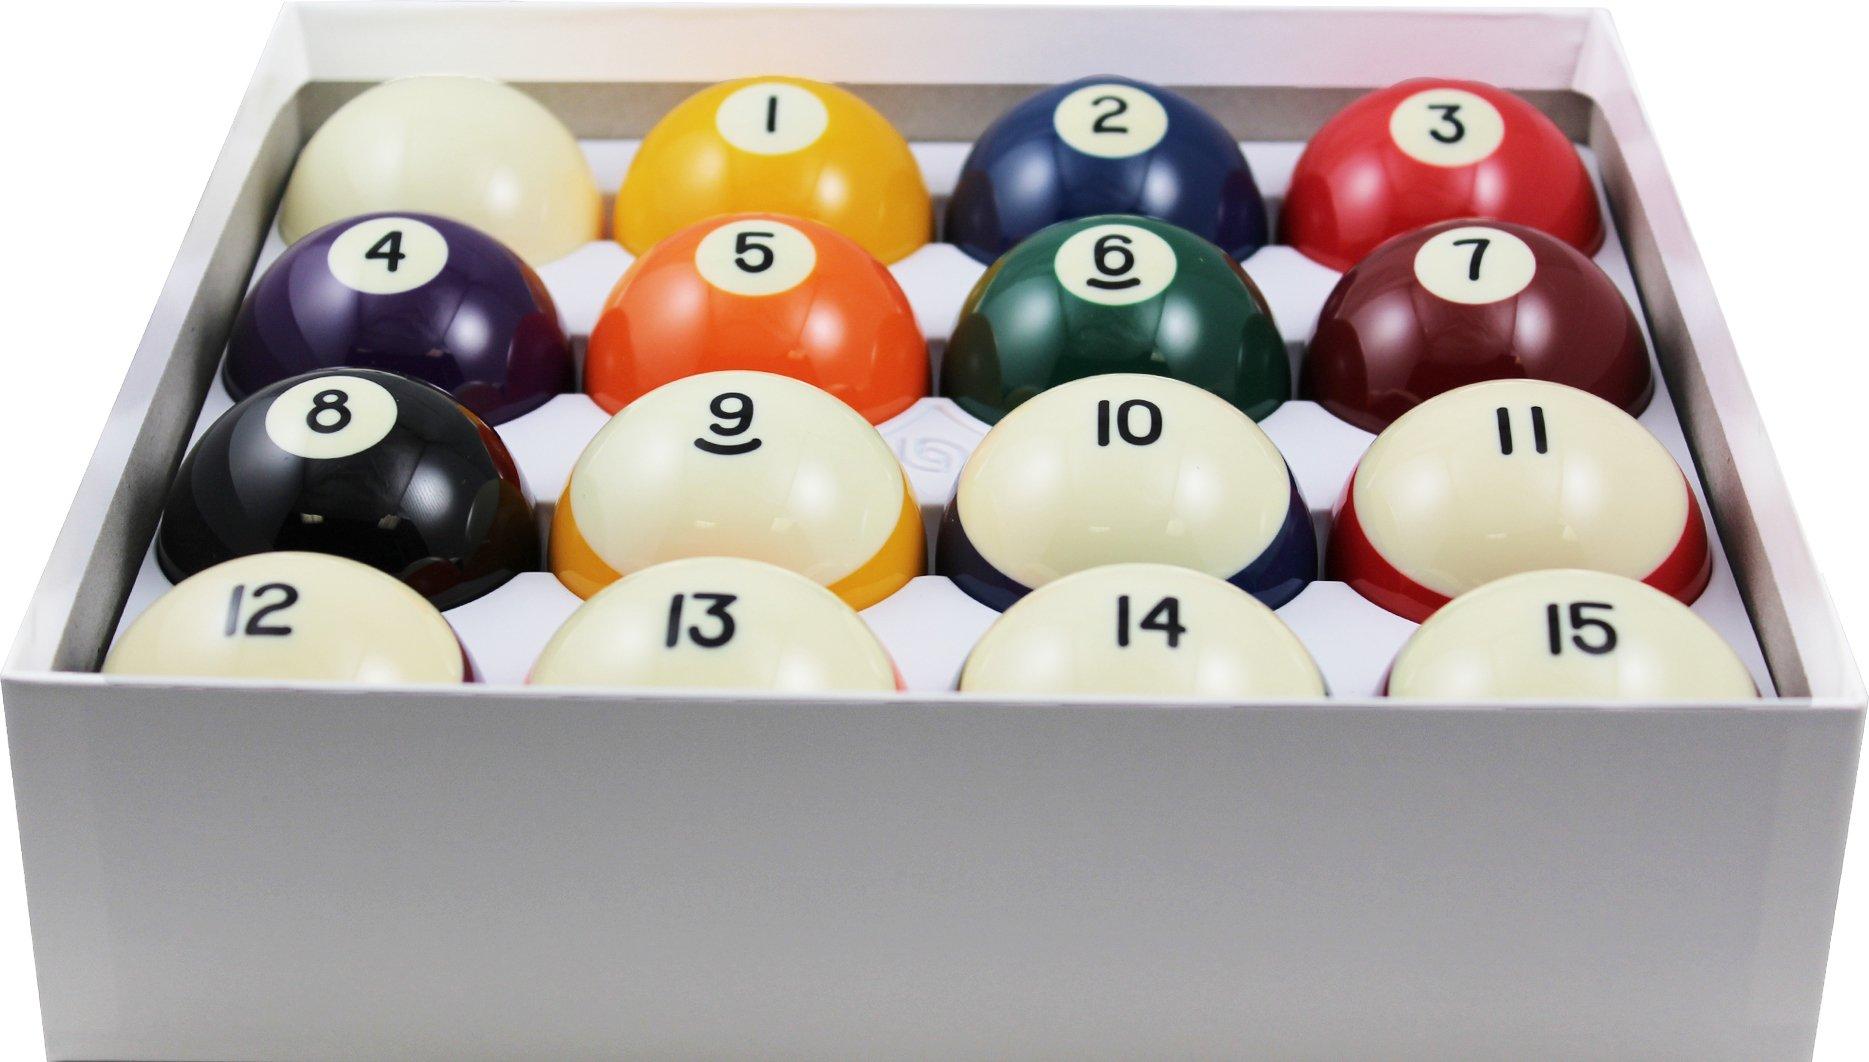 Aramith 2-1/4'' Regulation Size Crown Standard Billiard/Pool Balls, Complete 16 Ball Set